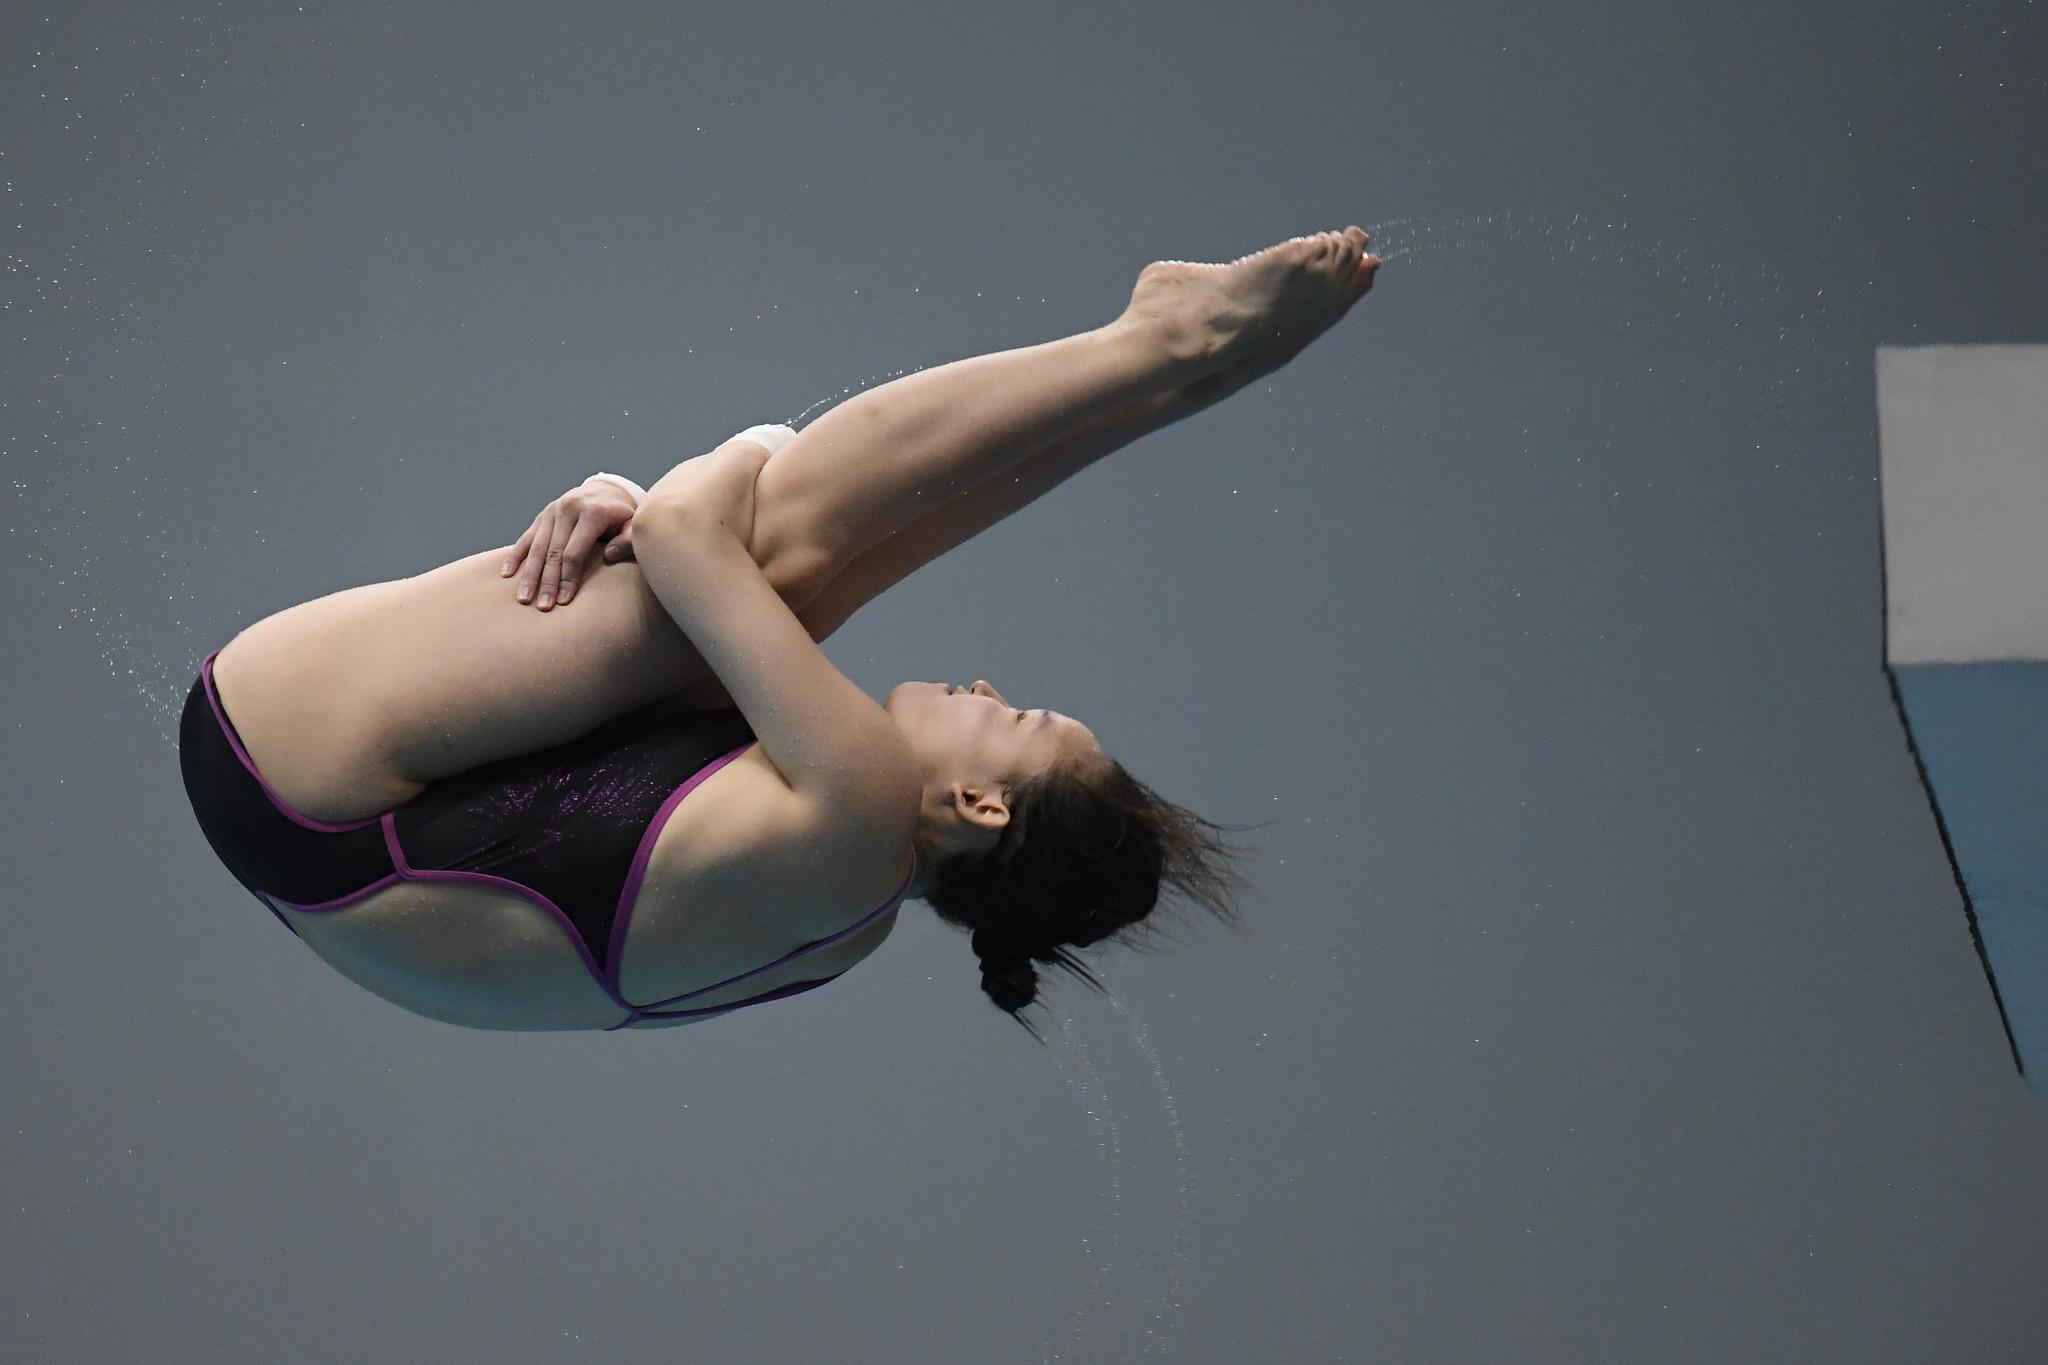 Ren Qian won the women's 10m platform final today ©Getty Images